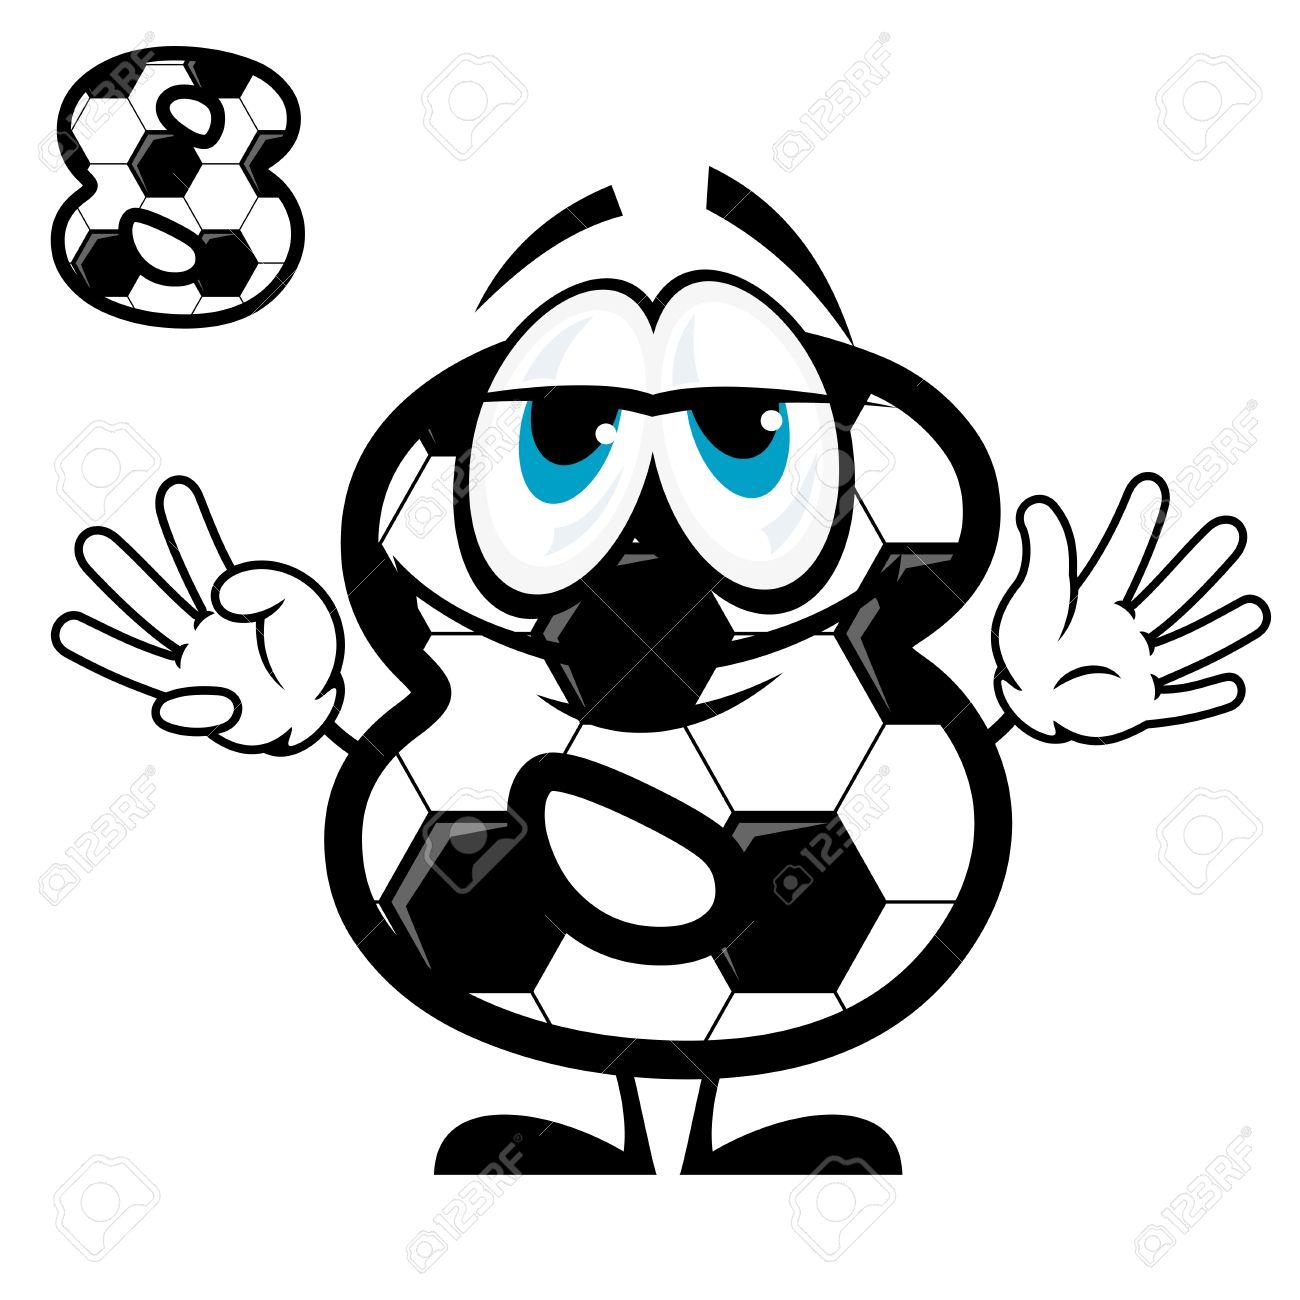 Futbol Sala Dibujos Para Colorear. Finest Futbol Sala Dibujos Para ...